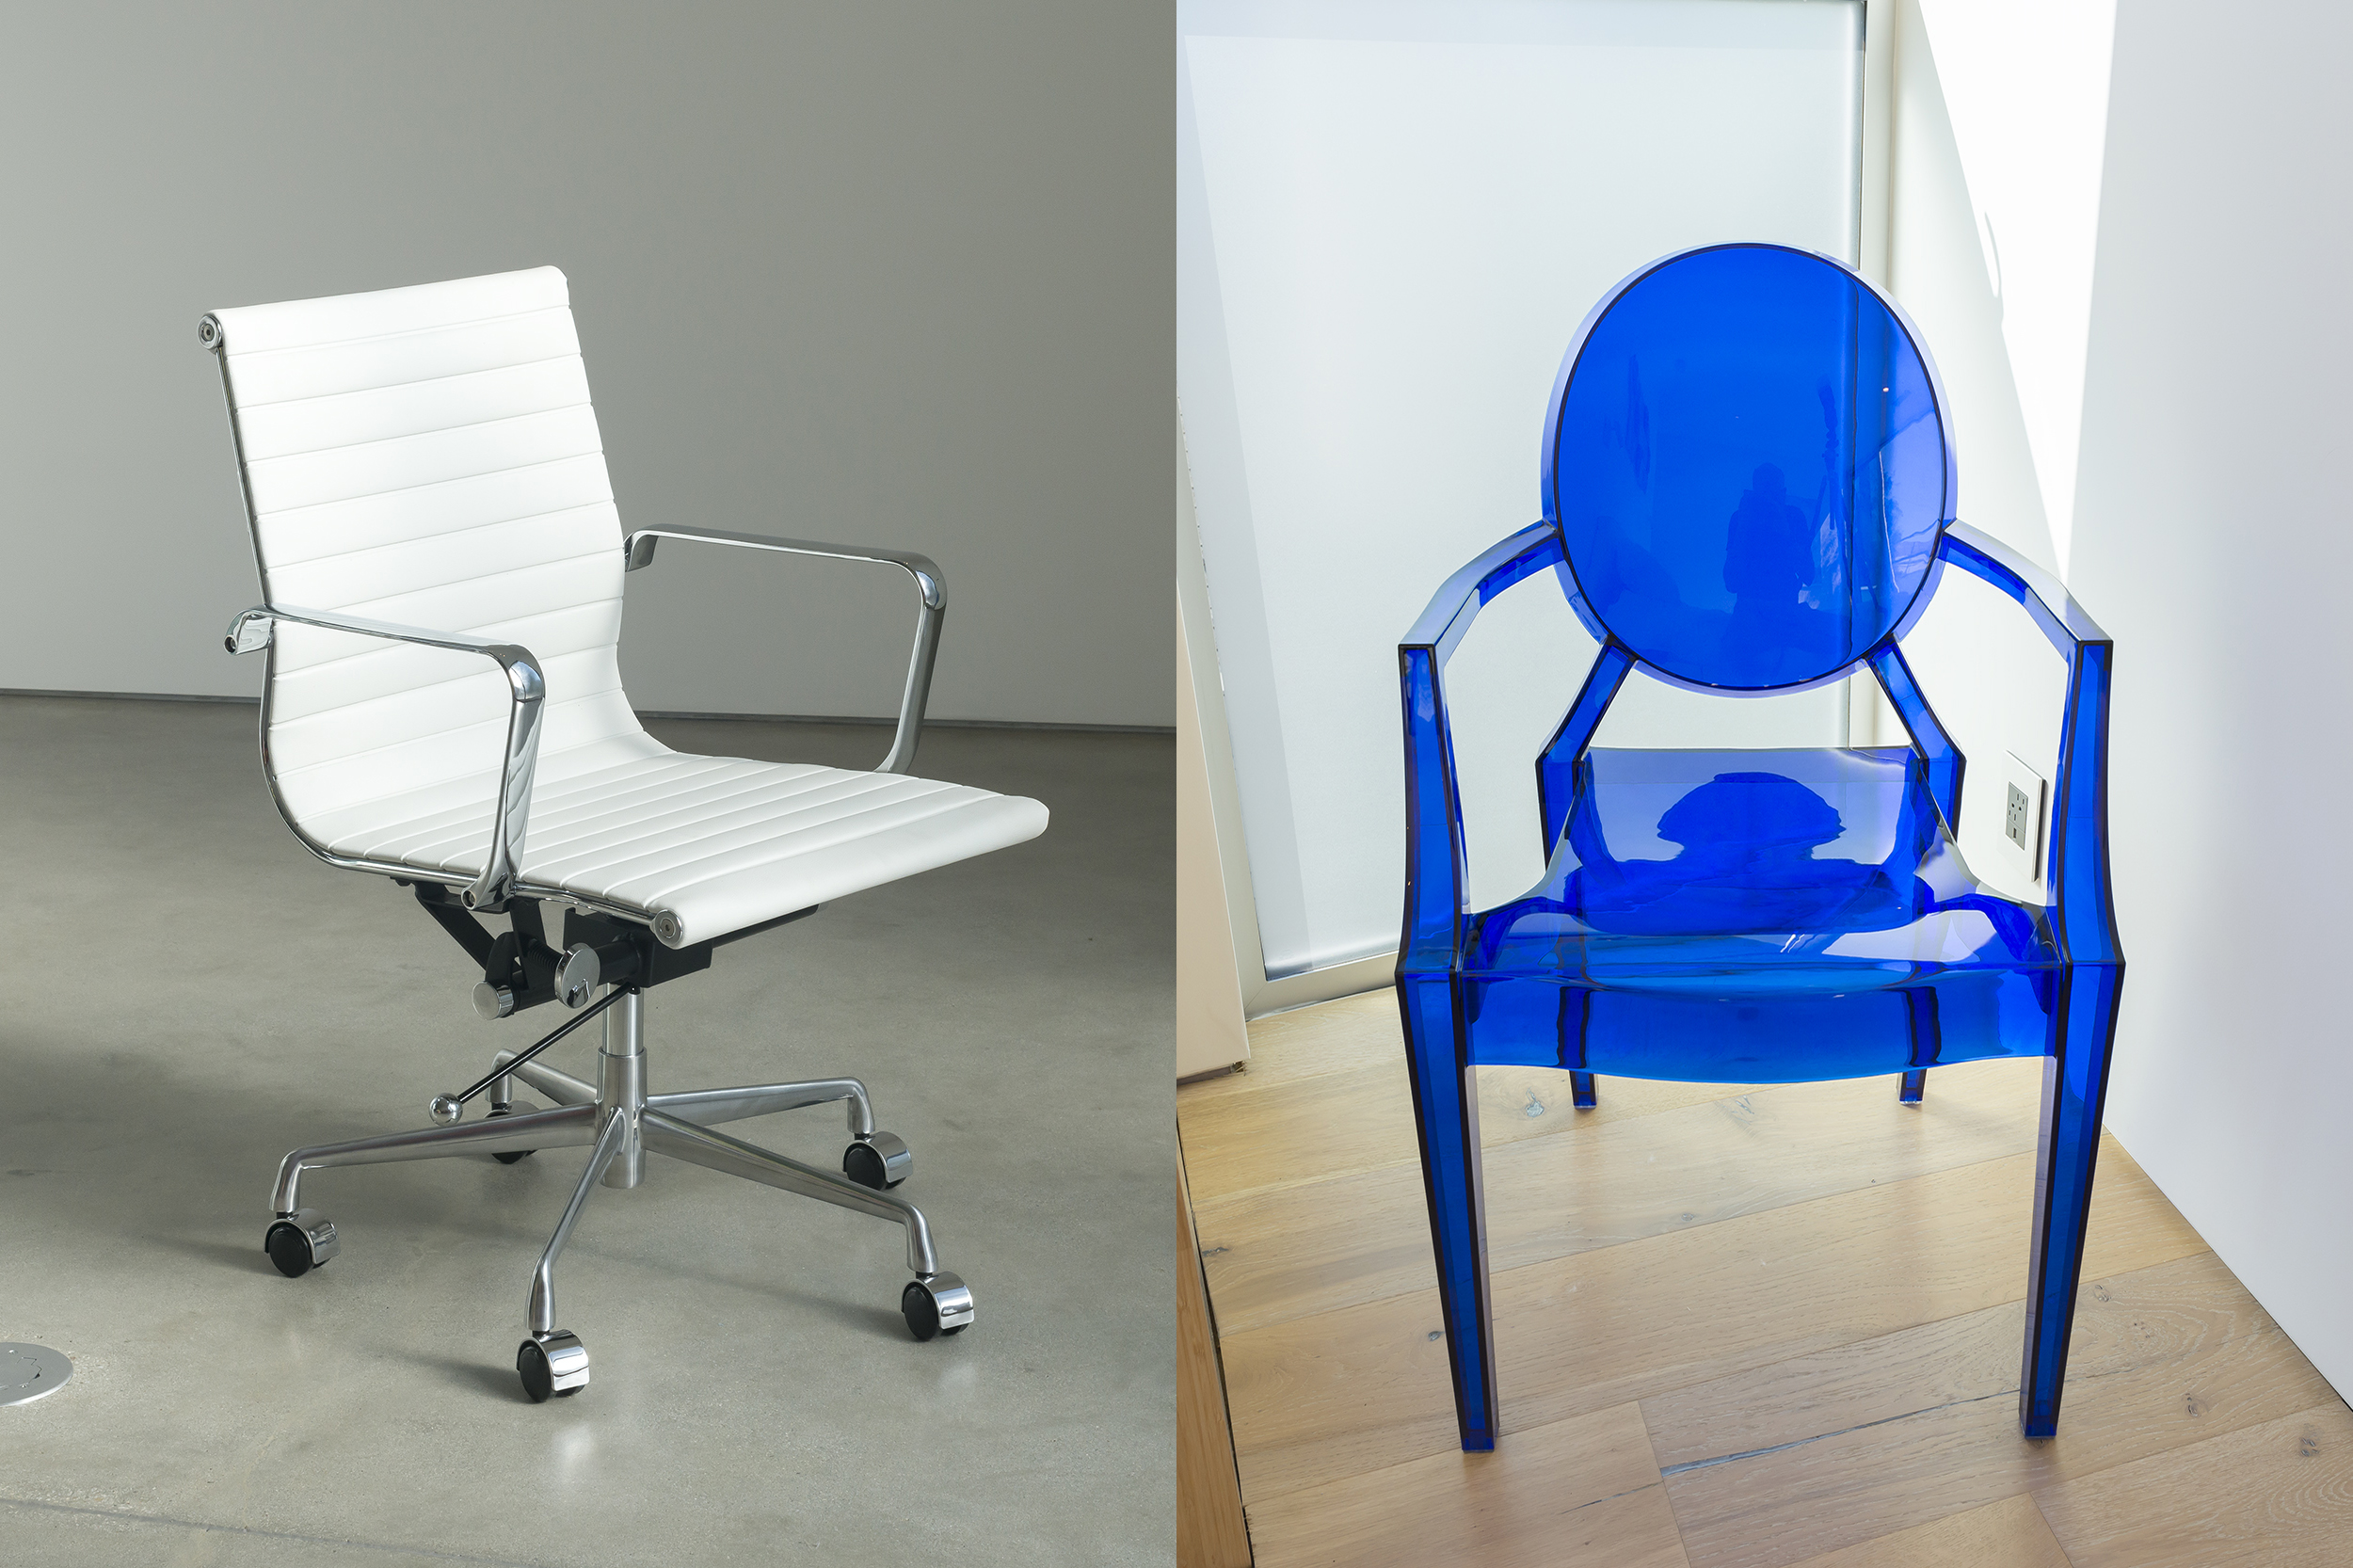 cameron-mcnall-4016-tivoli-white-blue.jpg